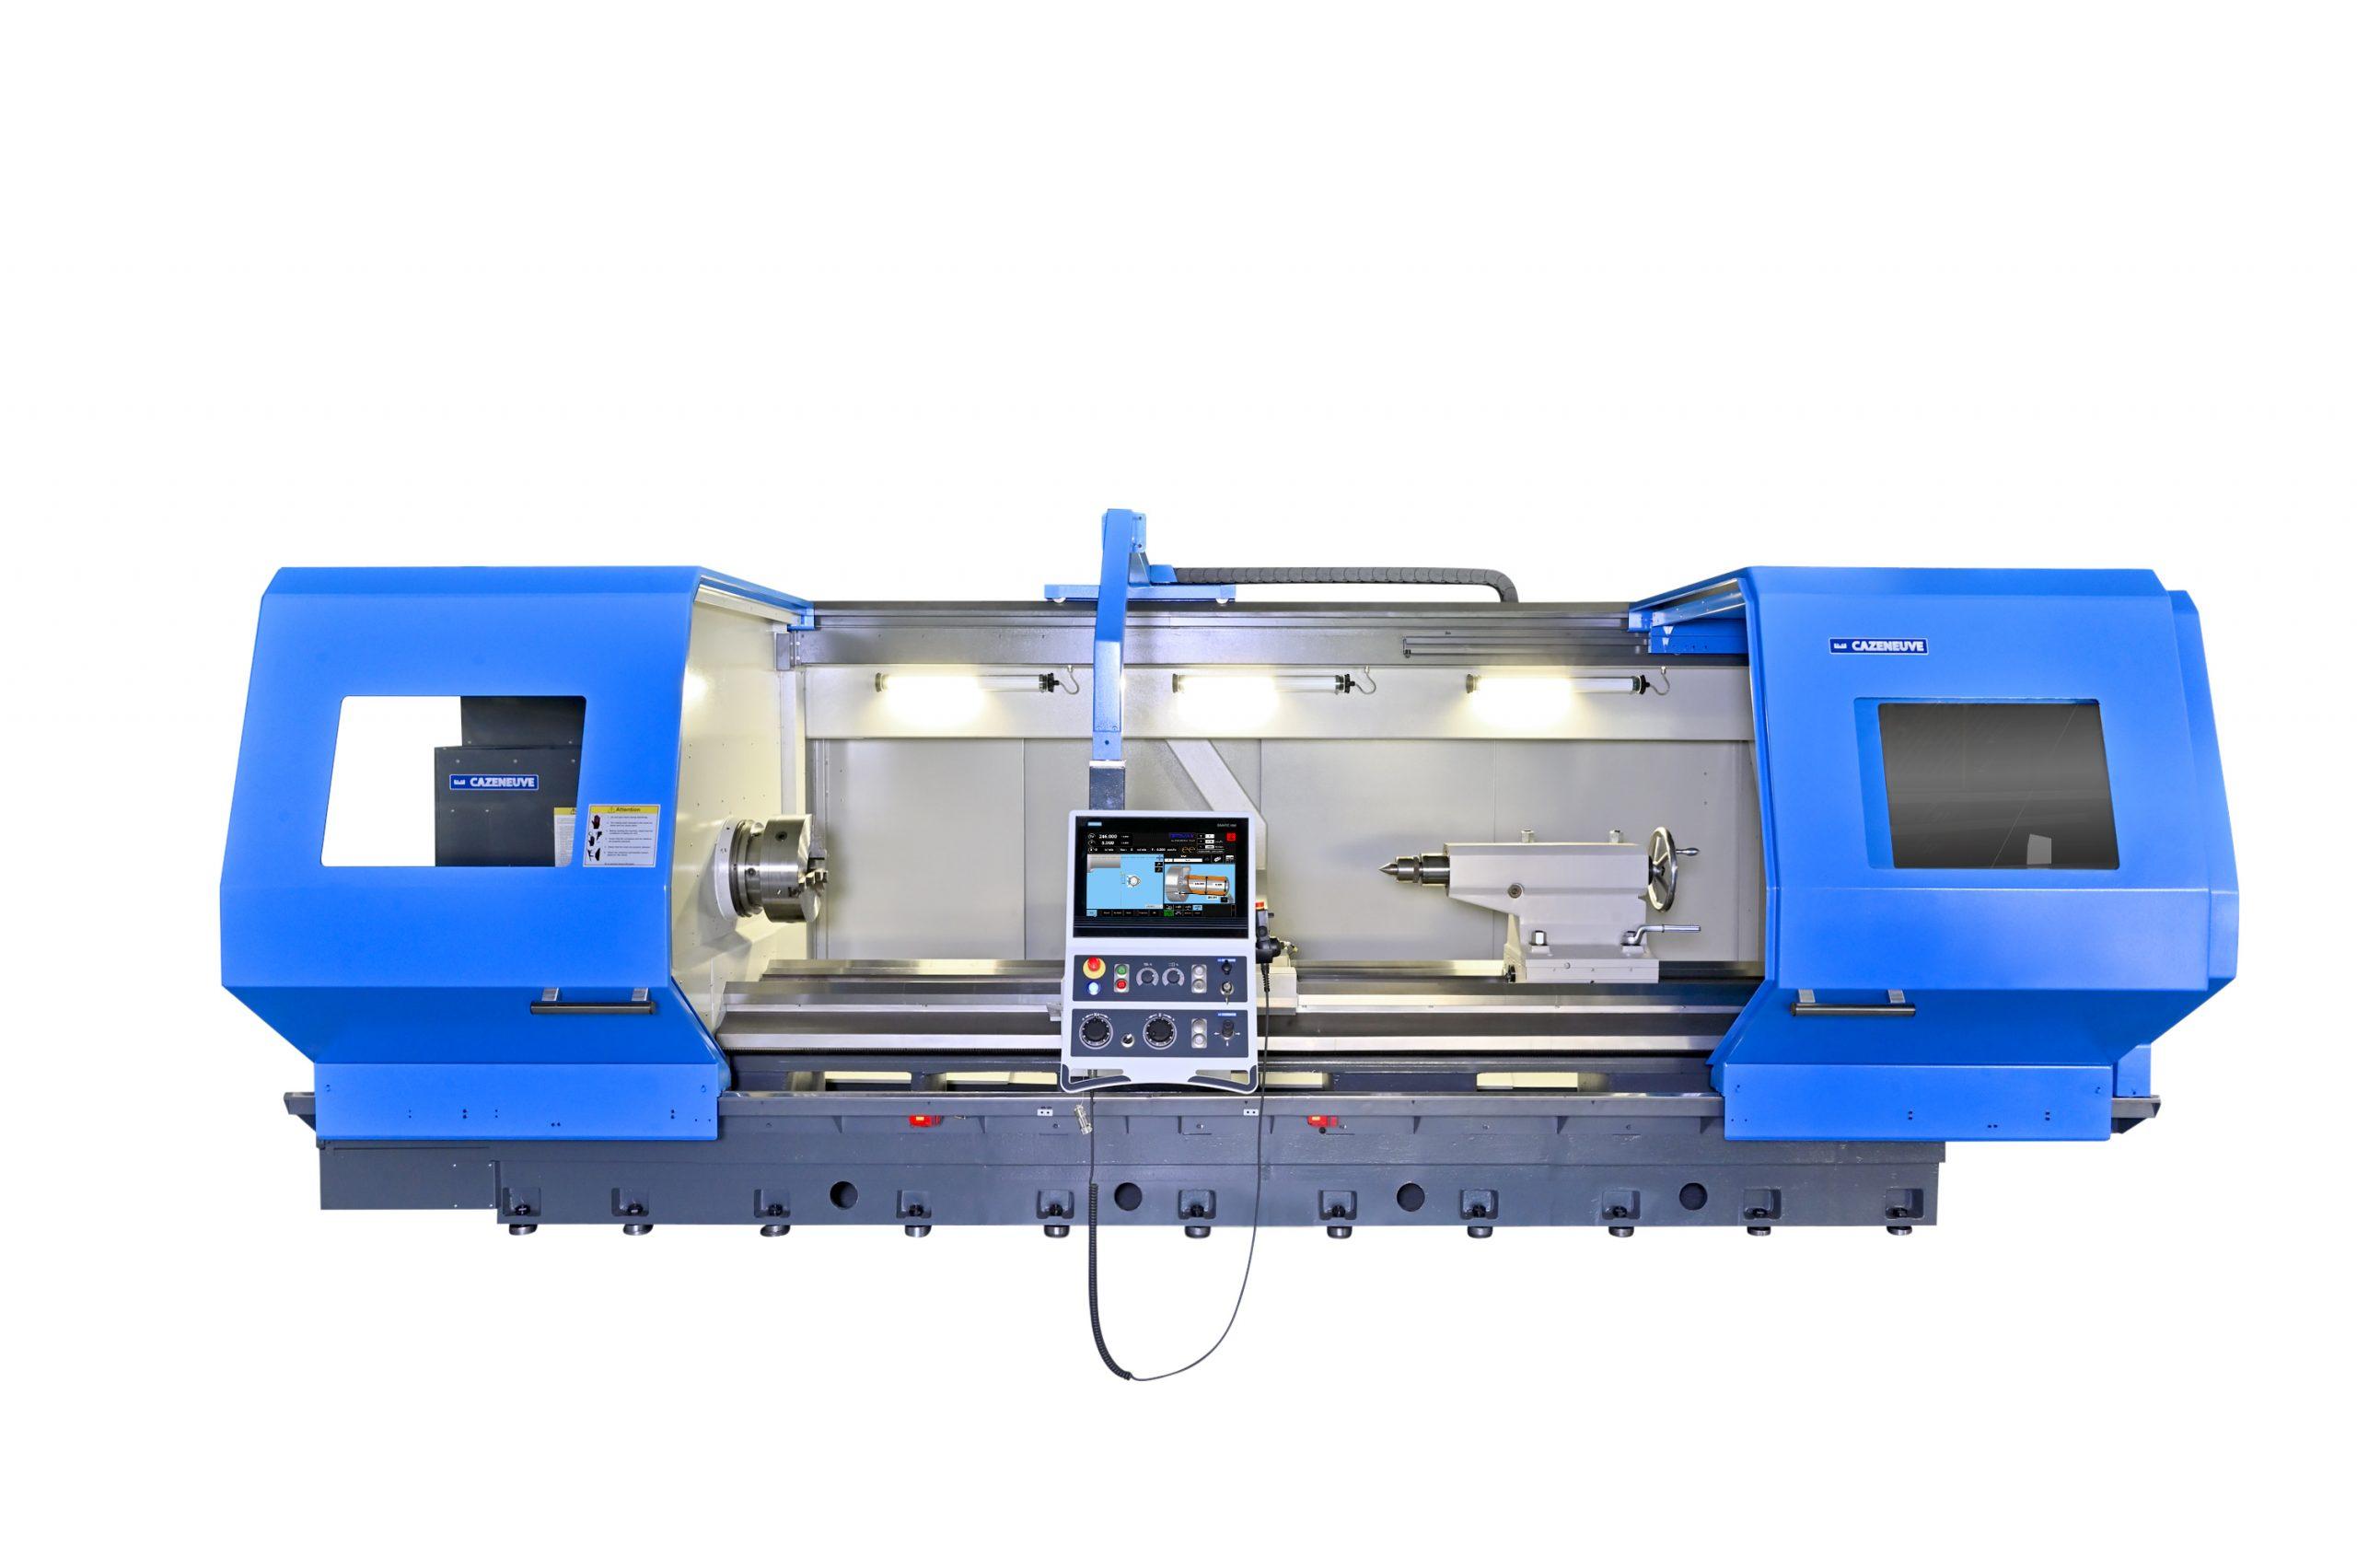 OPTIMAX 830 ep 3000 - Face machine